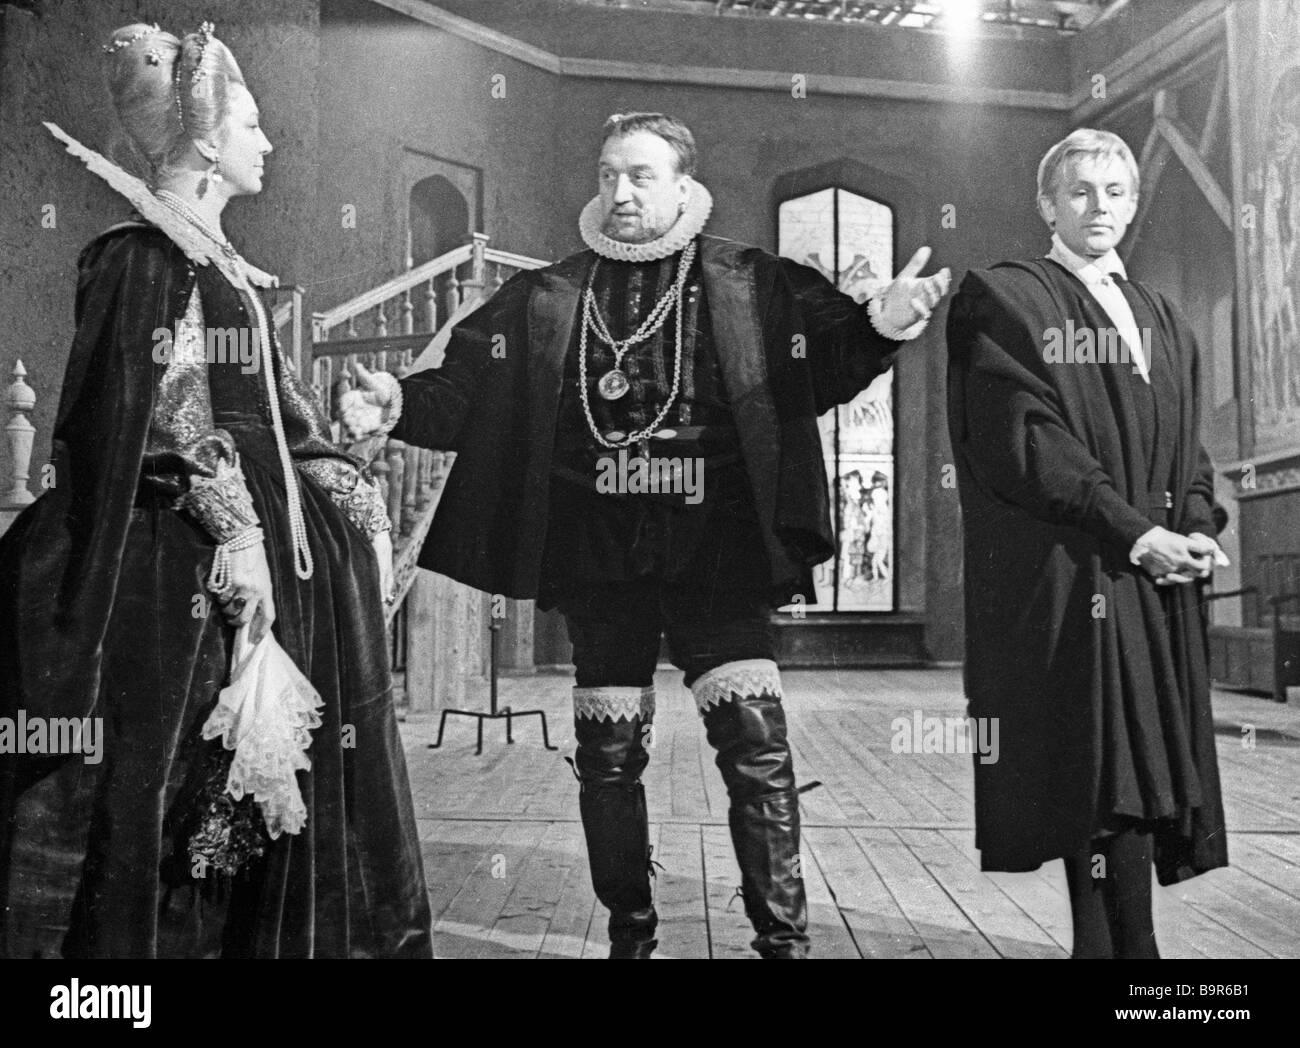 Actors Innokenty Smoktunovsky right as Hamlet Mikhail Nazvanov center as Claudius and Elza Radzinya left as Queen - Stock Image